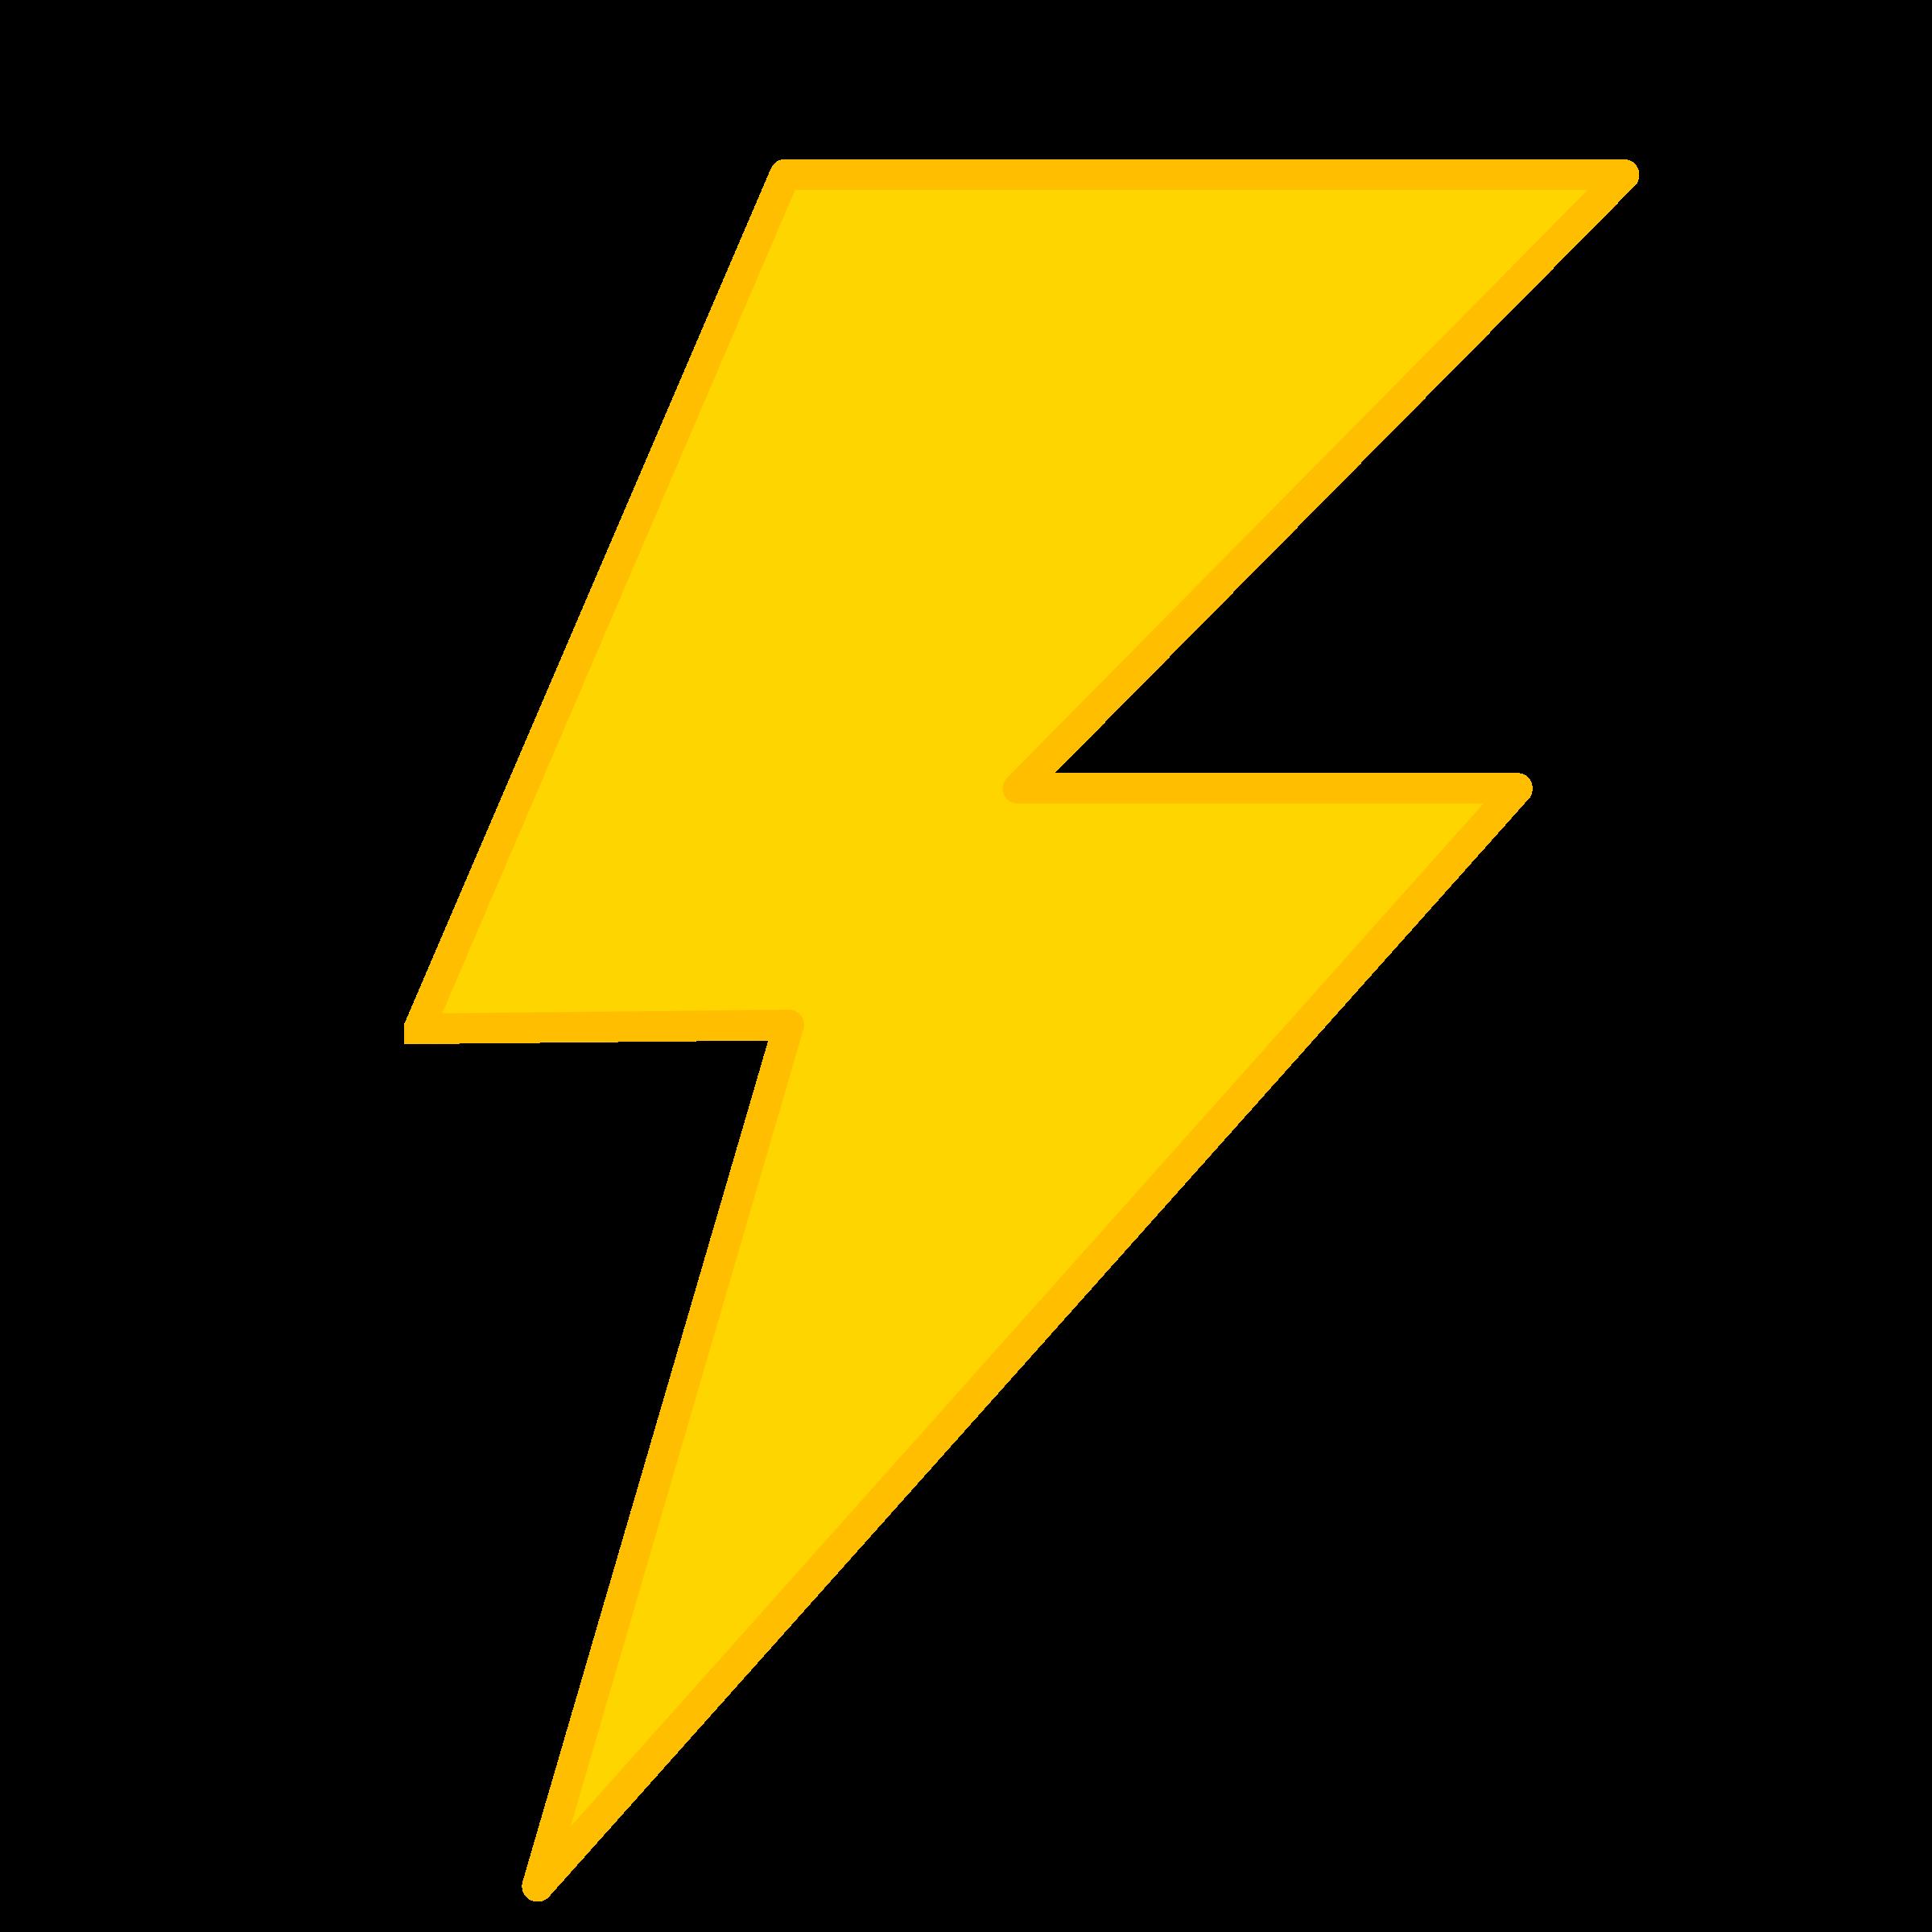 Electric clipart lightning flash. Yellow png transparentpng